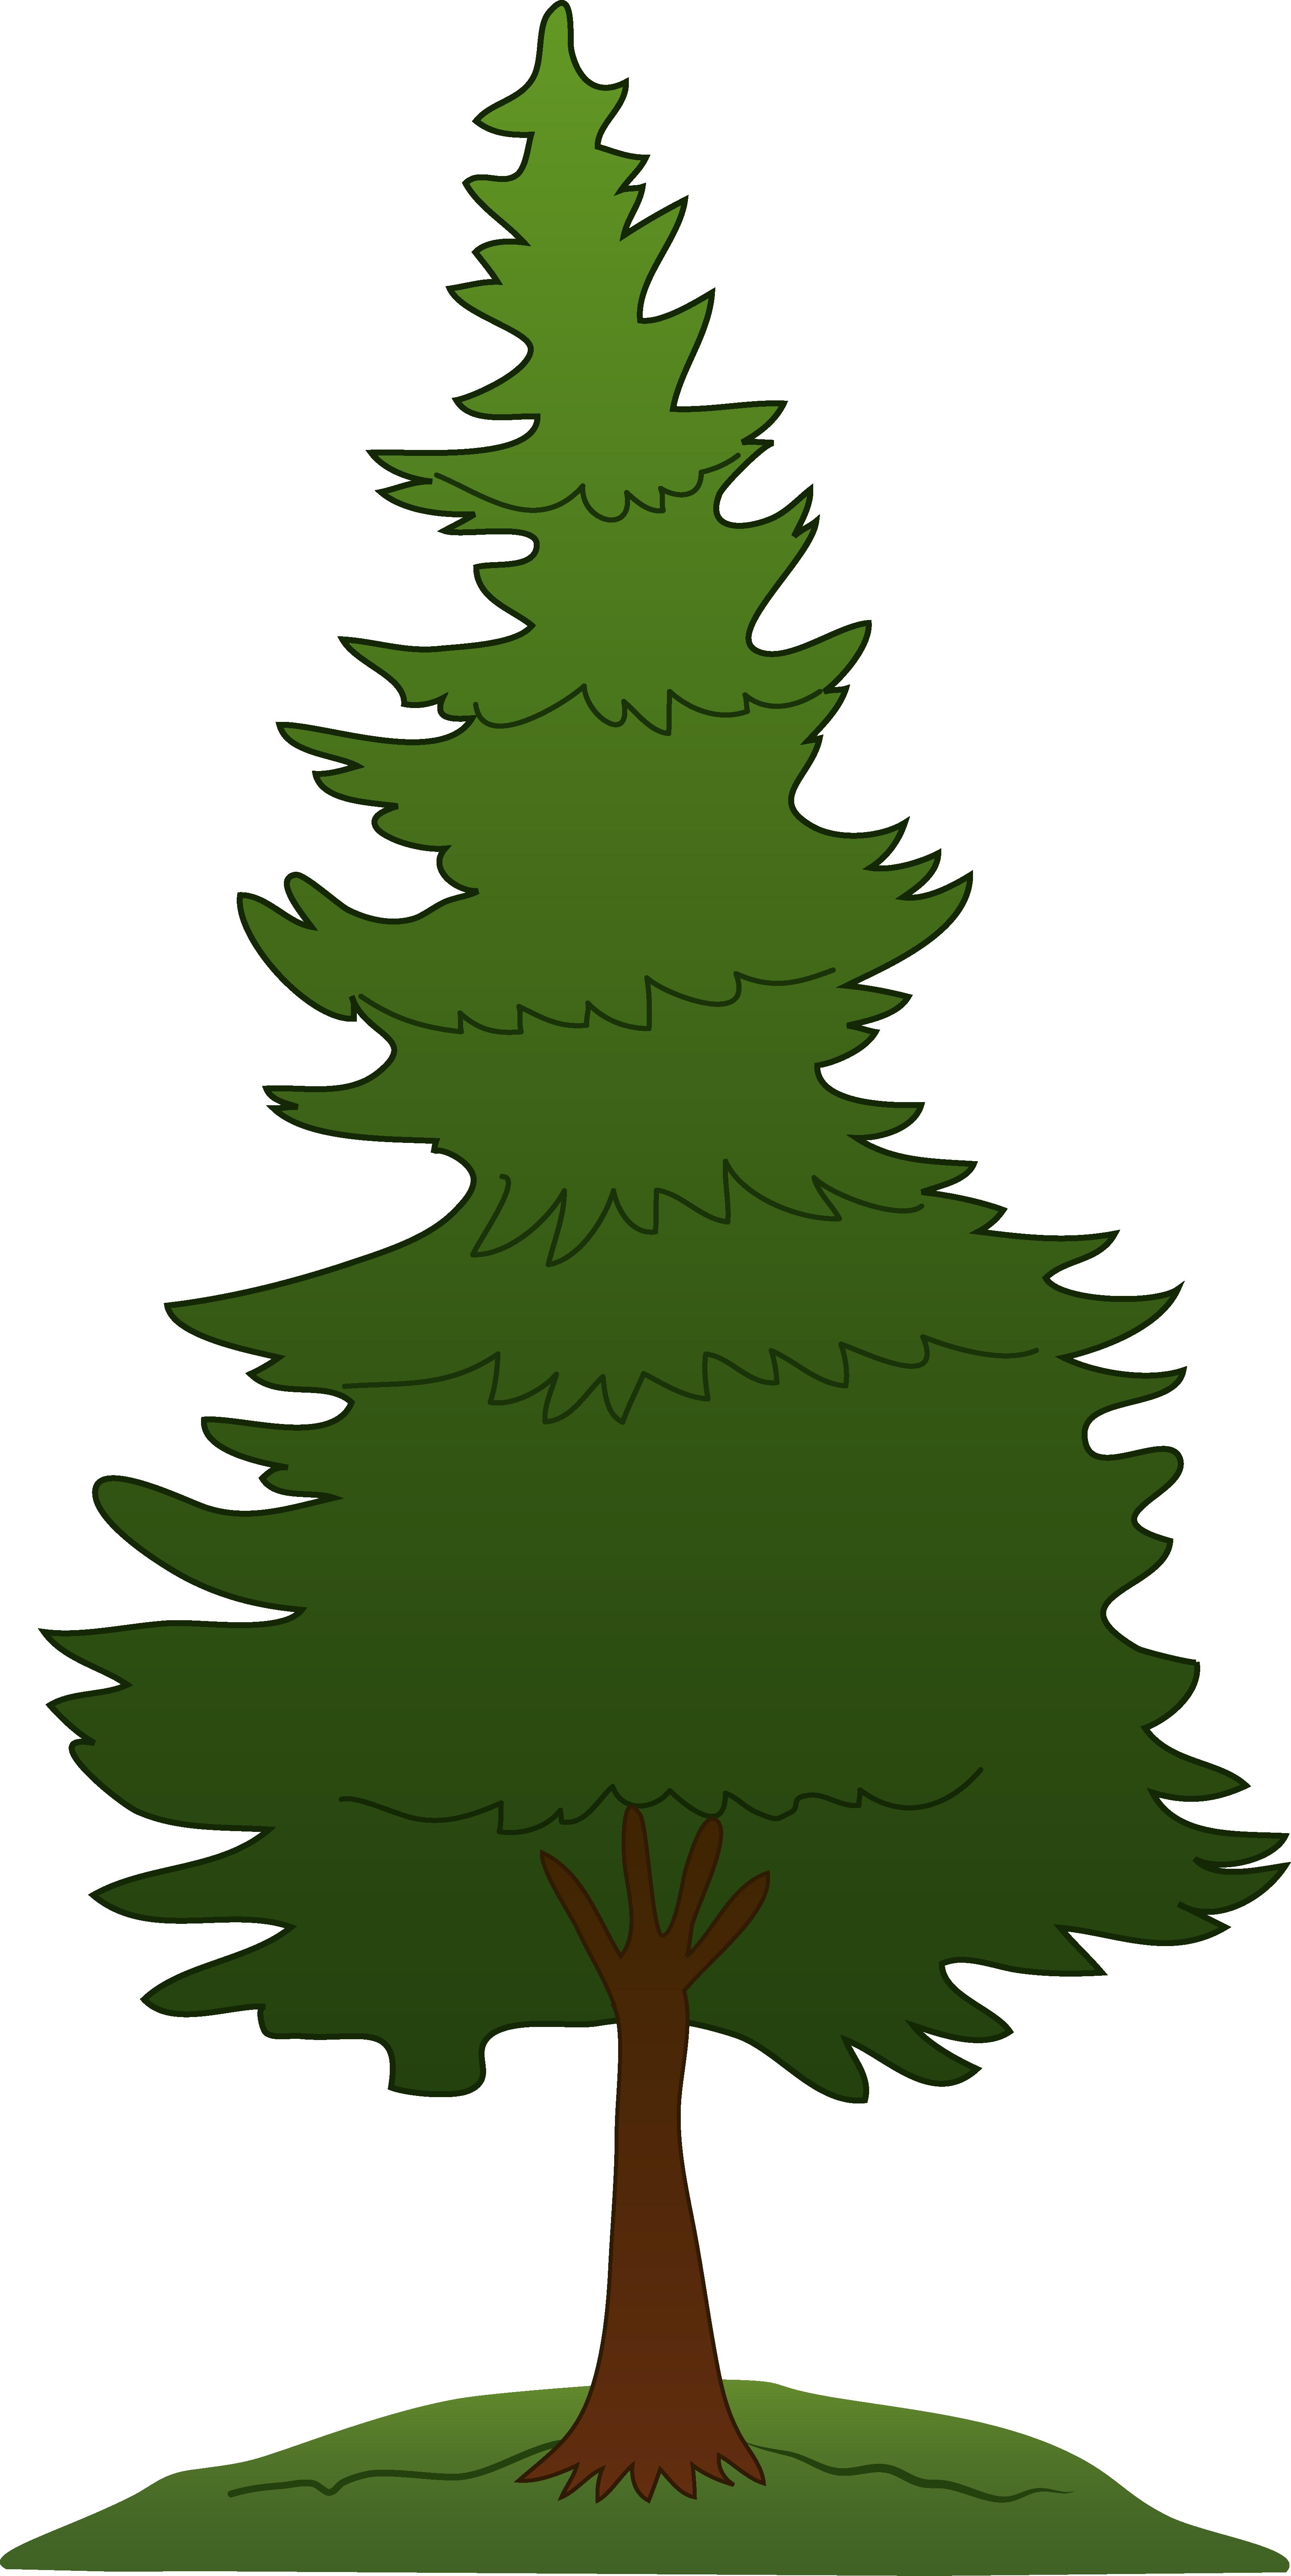 Evergreen Tree Clip Art. Green Pine Tree-Evergreen Tree Clip Art. Green Pine Tree Design - Free .-6